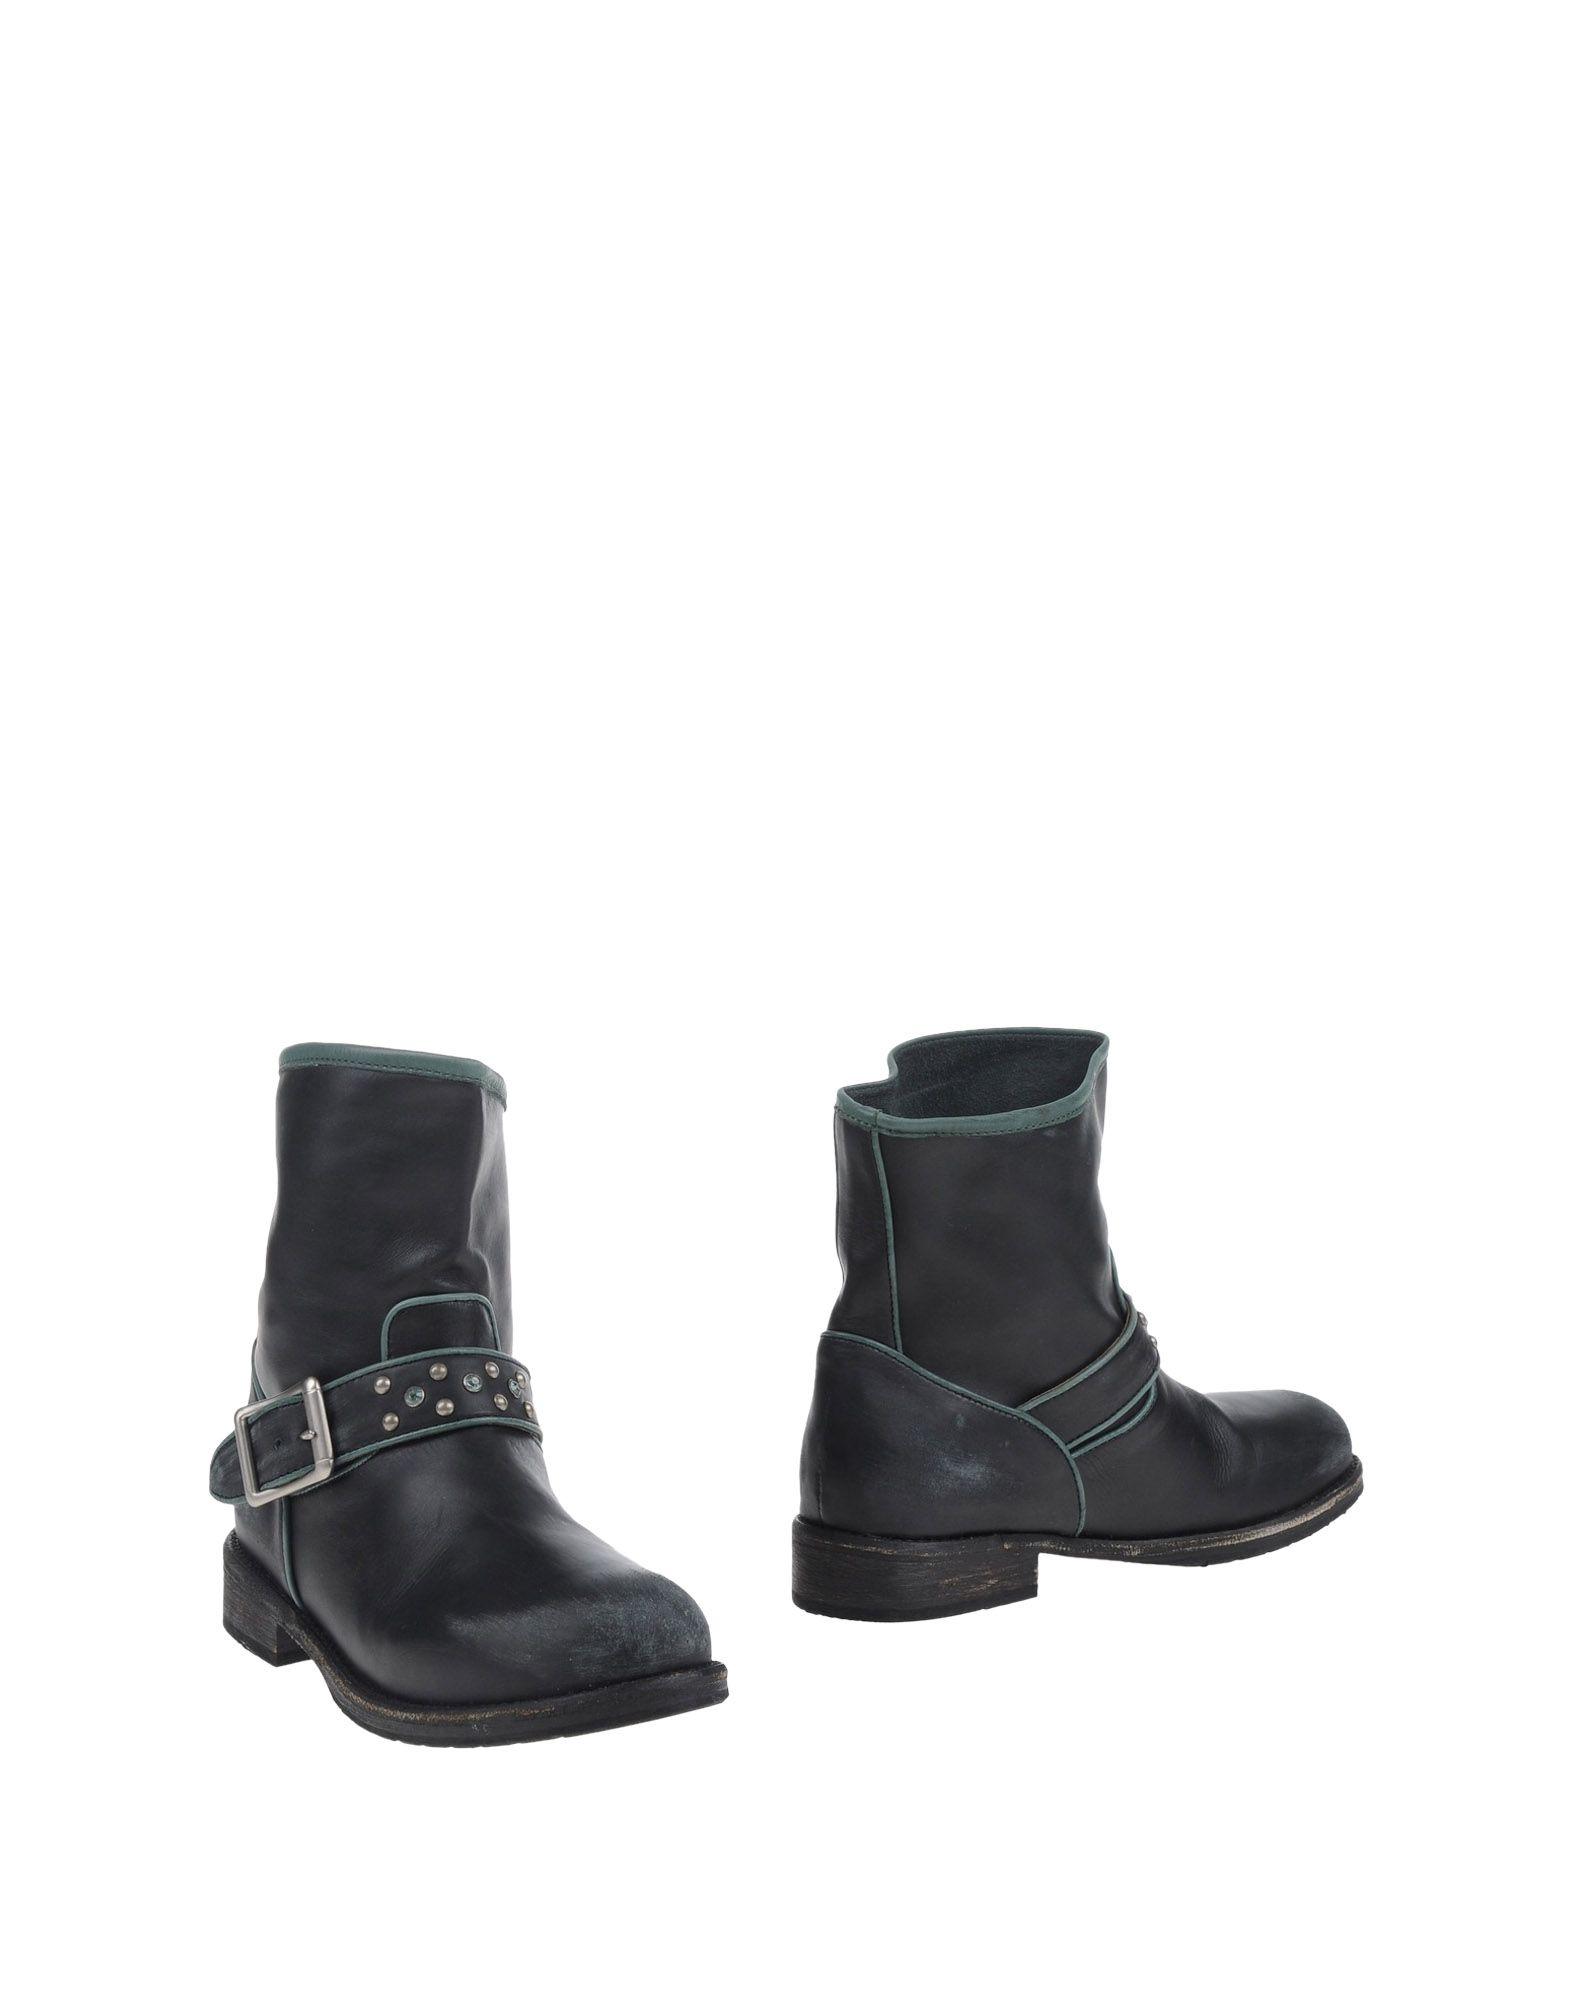 MR. WOLF Полусапоги и высокие ботинки mr z 1 6 set steppe wolf animal 20 cm lenght in stock